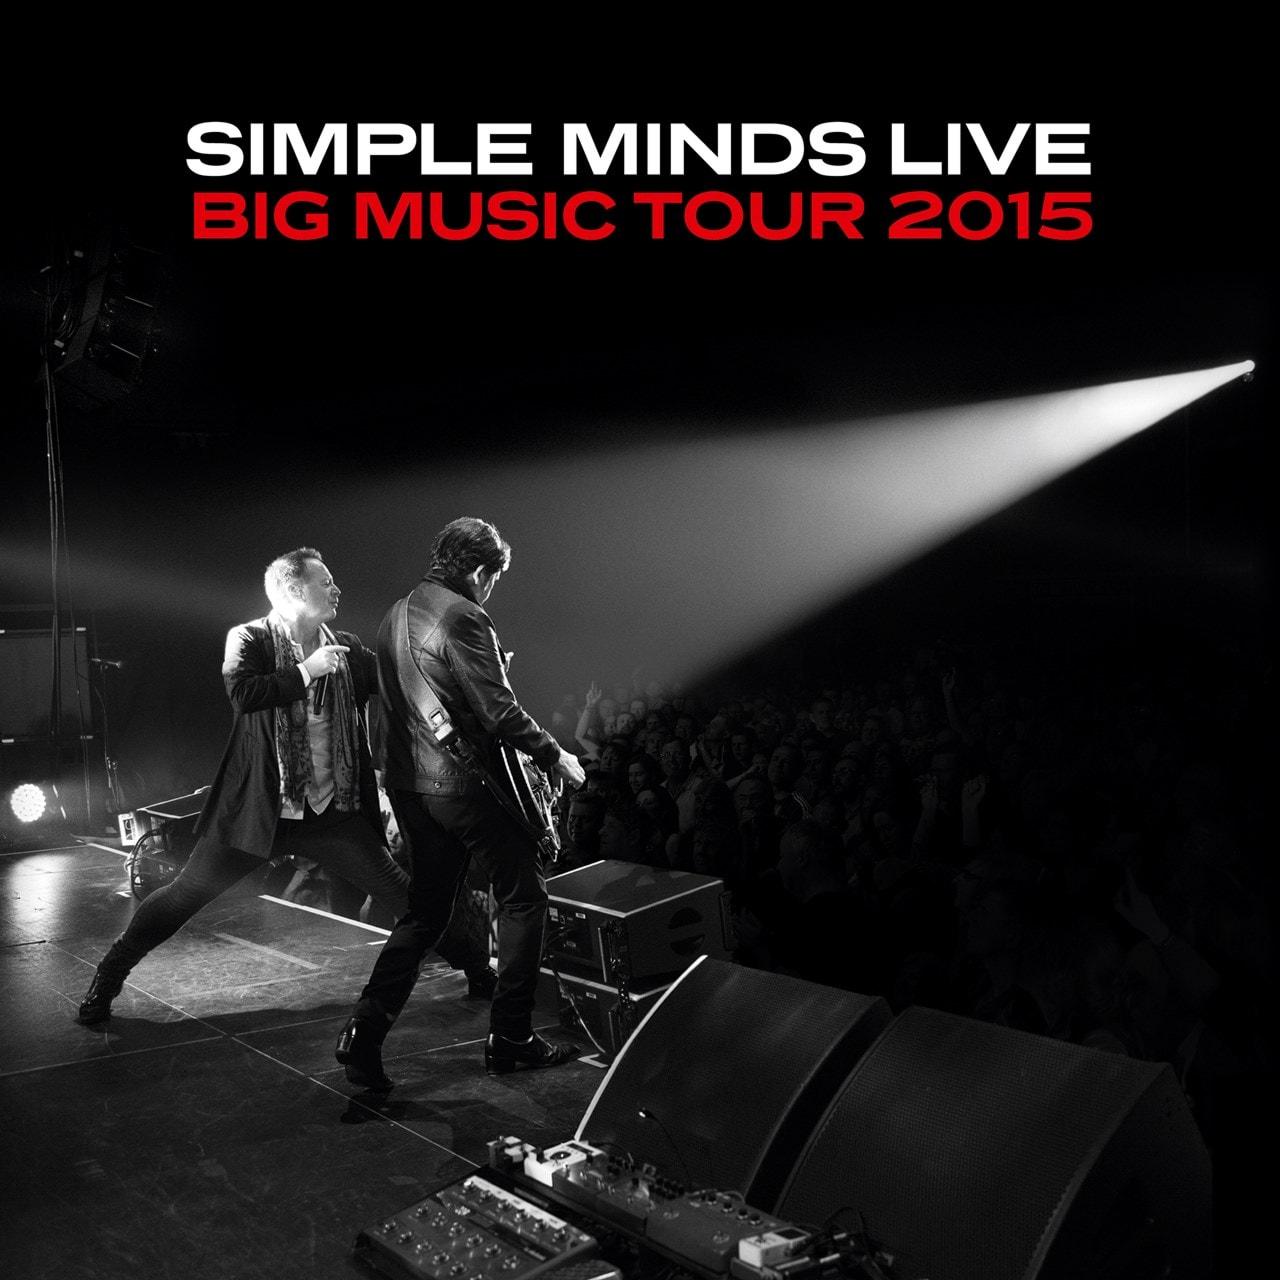 Big Music Tour 2015 - 1